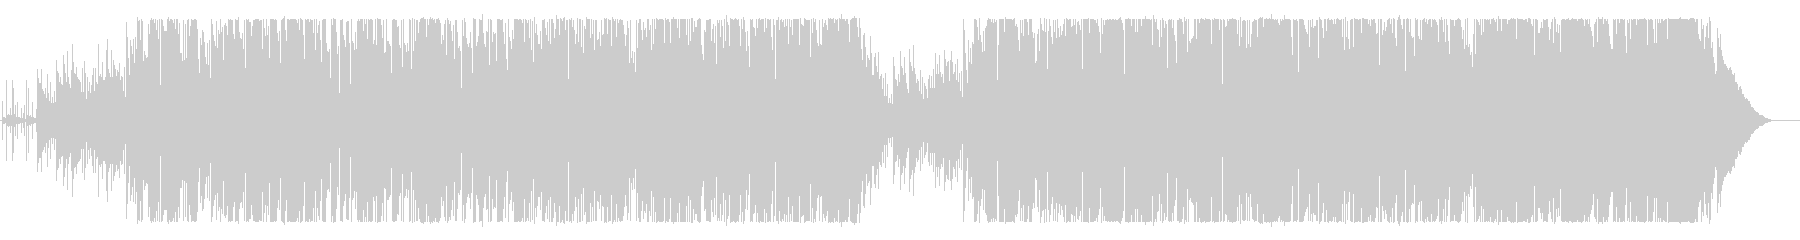 Romantic and adult atmosphere BGM's unreproduced waveform